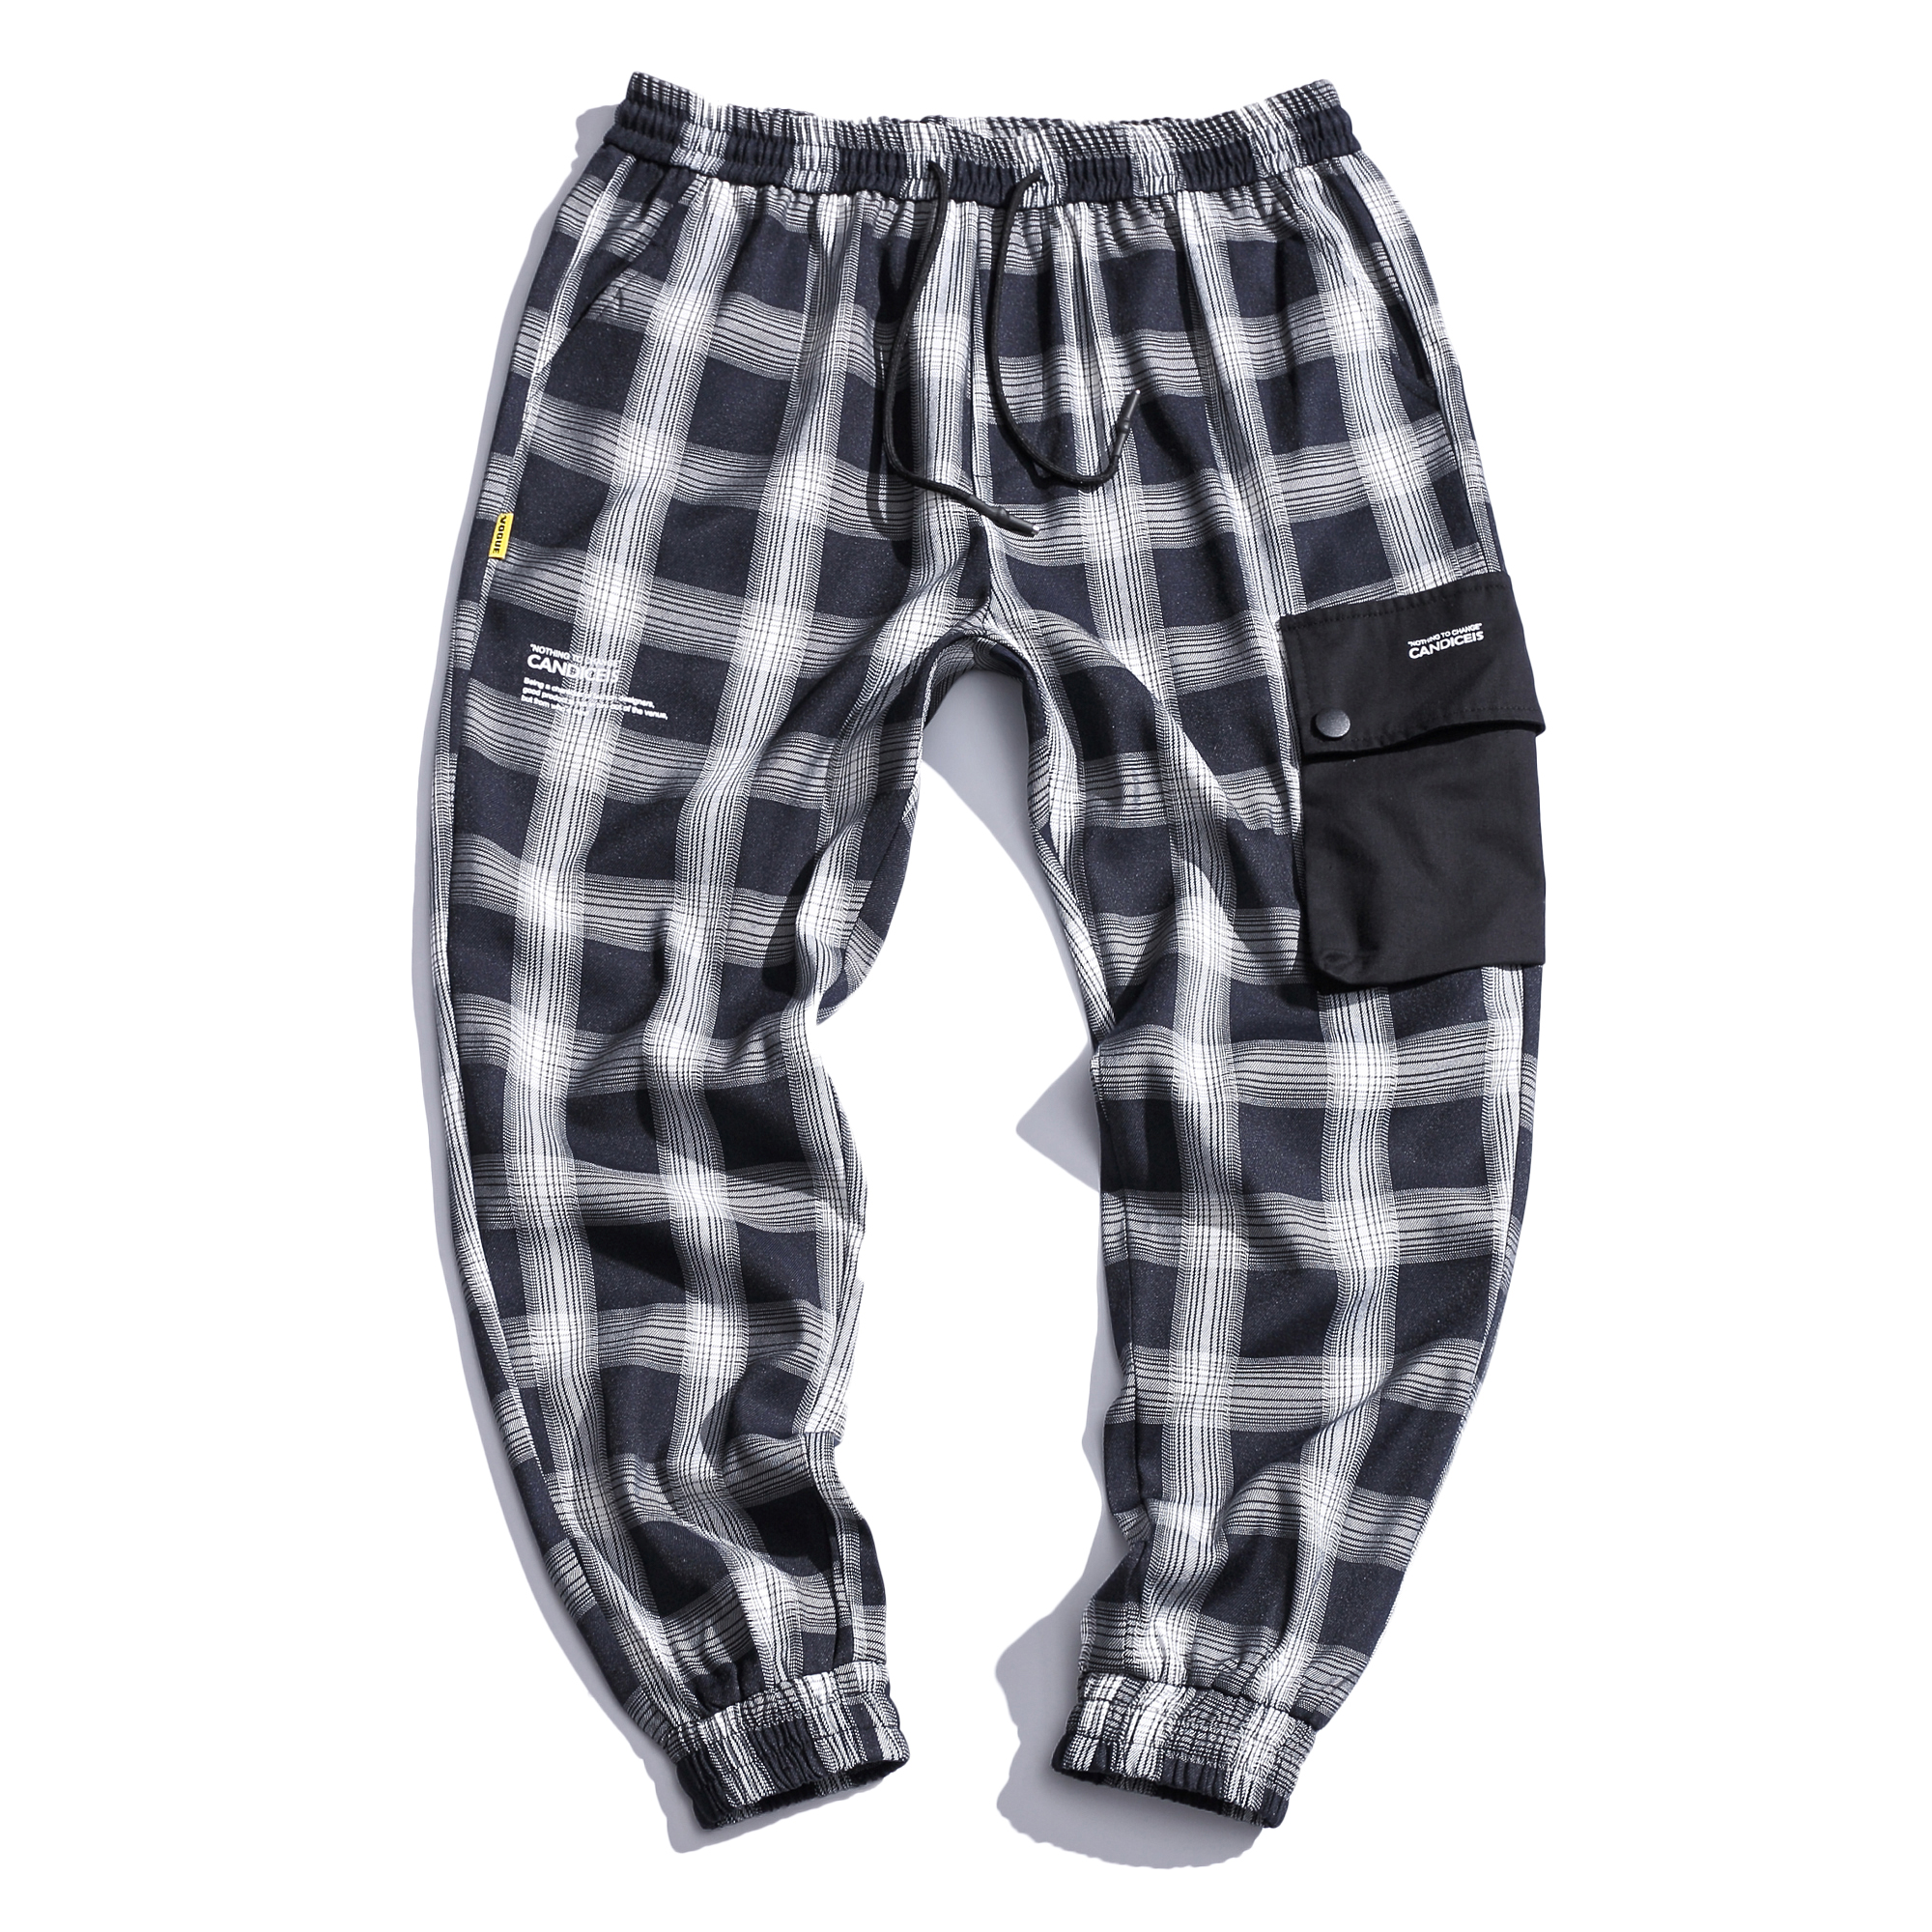 Hip 4xl Plaid Patchwork Black Modo Da red Streetwear Pantaloni Tuta Harem  green Pant Hop Della Uomo Di 5xl Casual Maschili nxXZwpI8qf 83e3145fa749